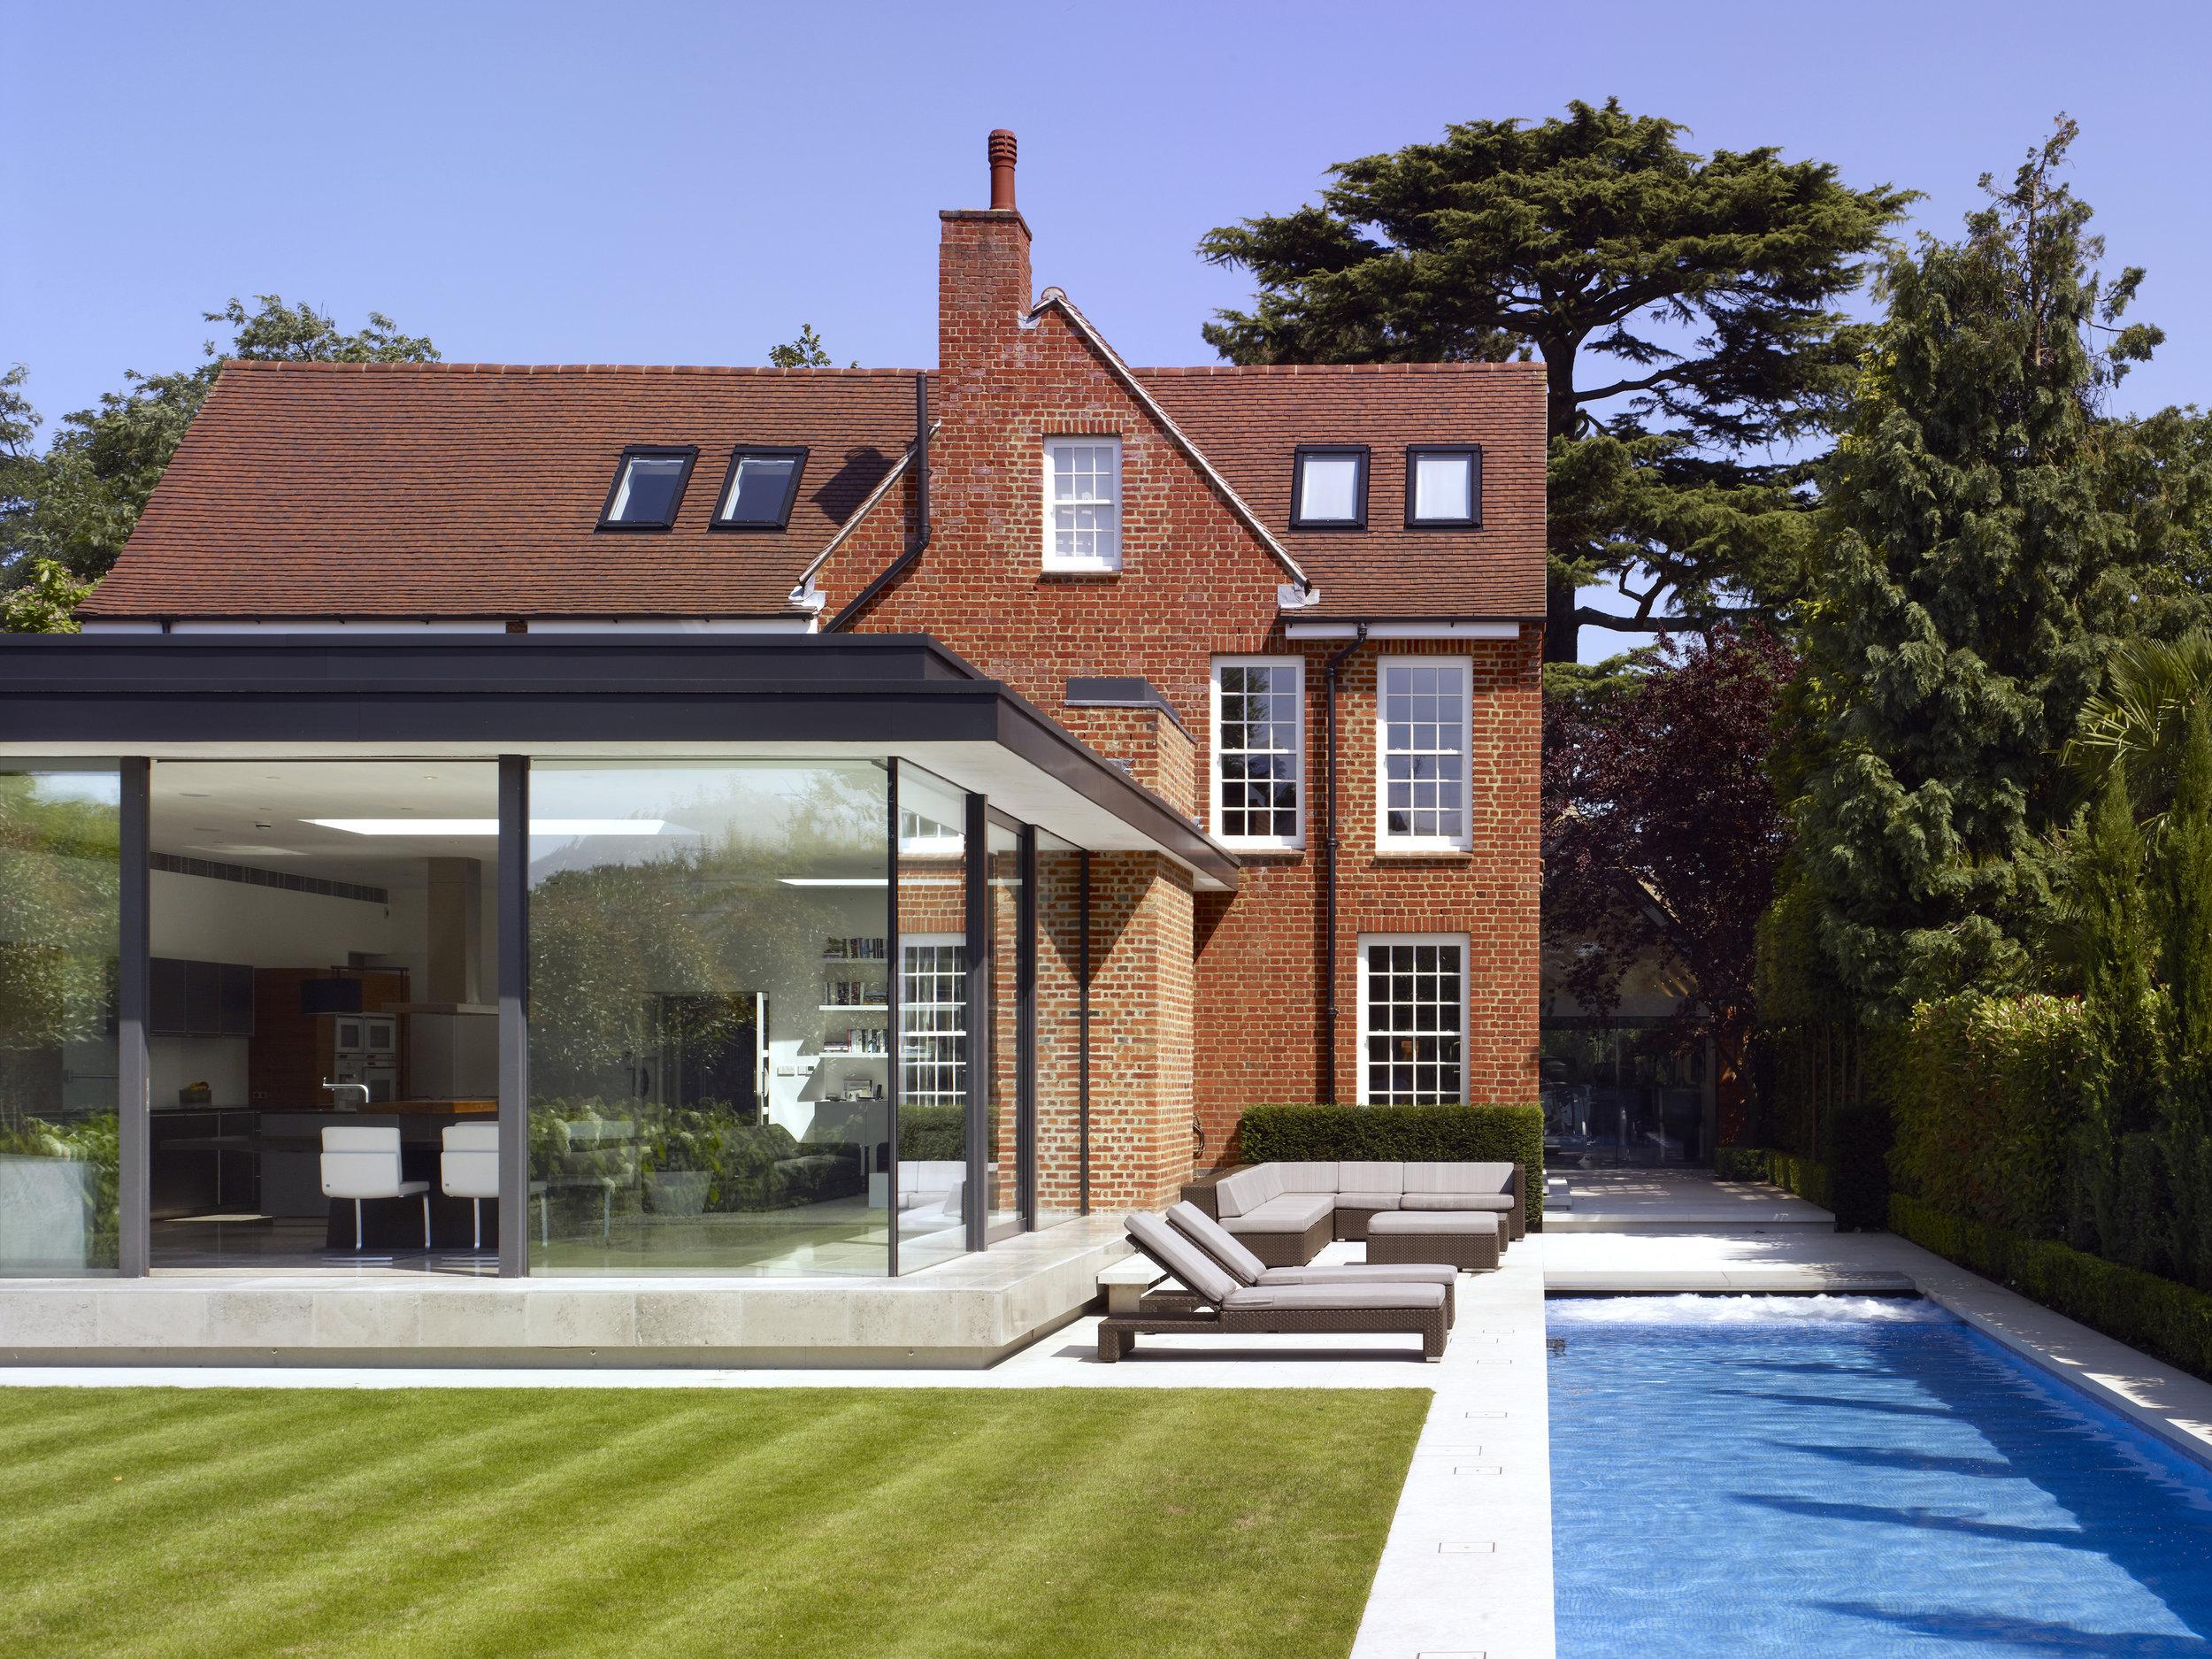 Award winning architecture practice thompson + baroni architects work on bespoke high end luxury architecture in central london chelsea kensington belgravia